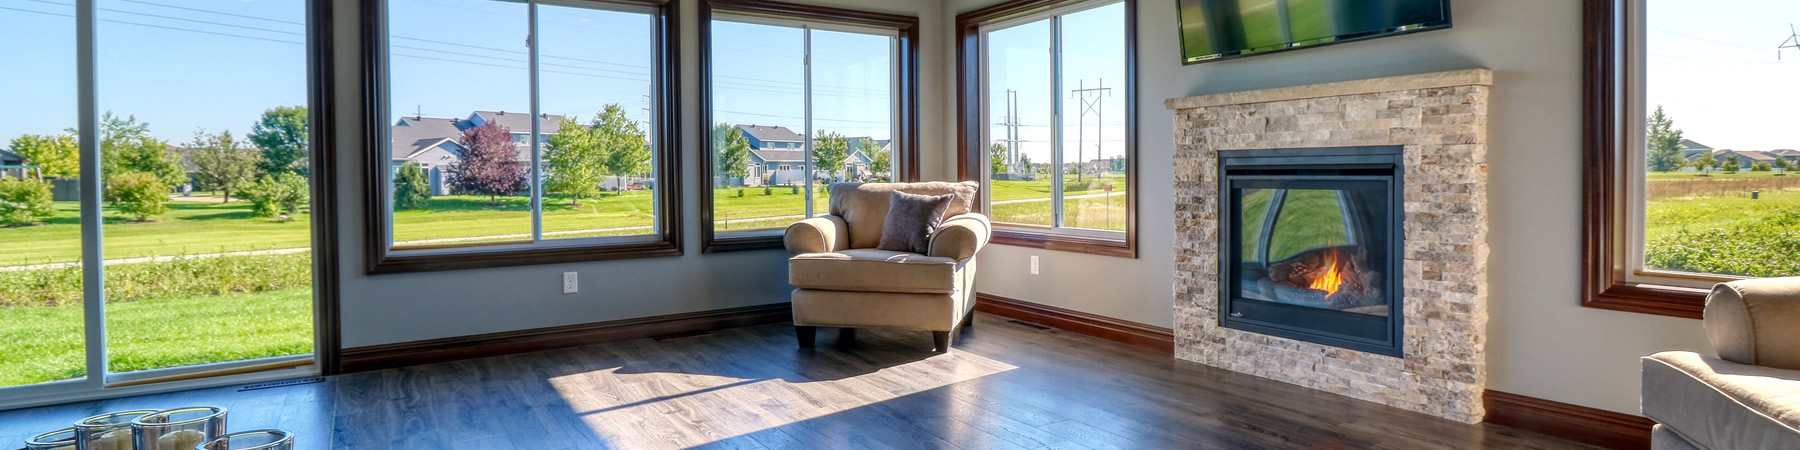 Equity Home Builders, LLC - Gallery